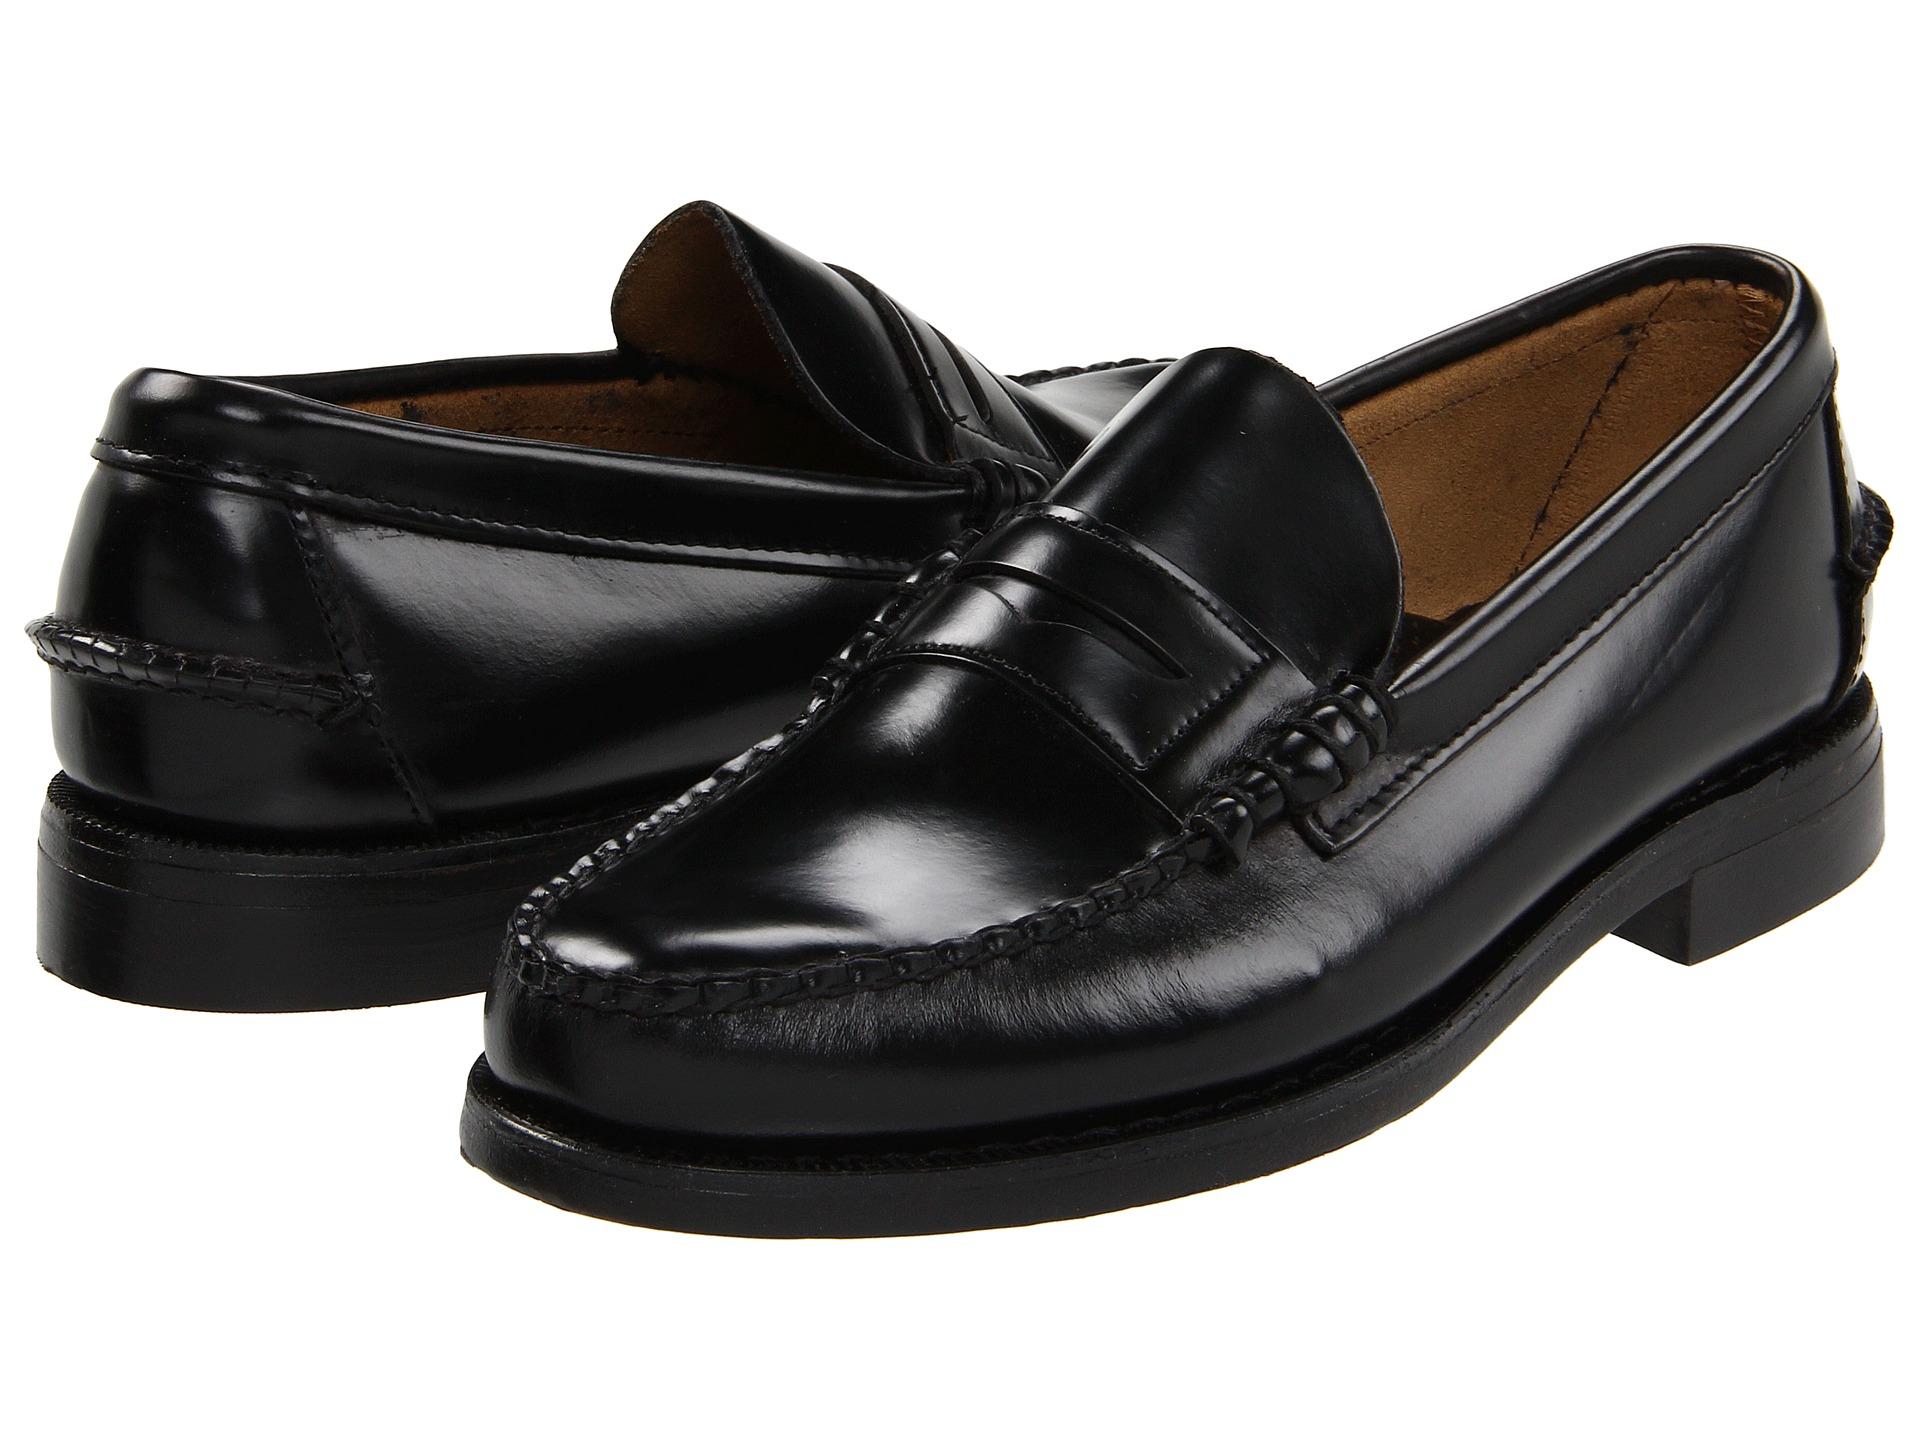 Sebago Black Shoes